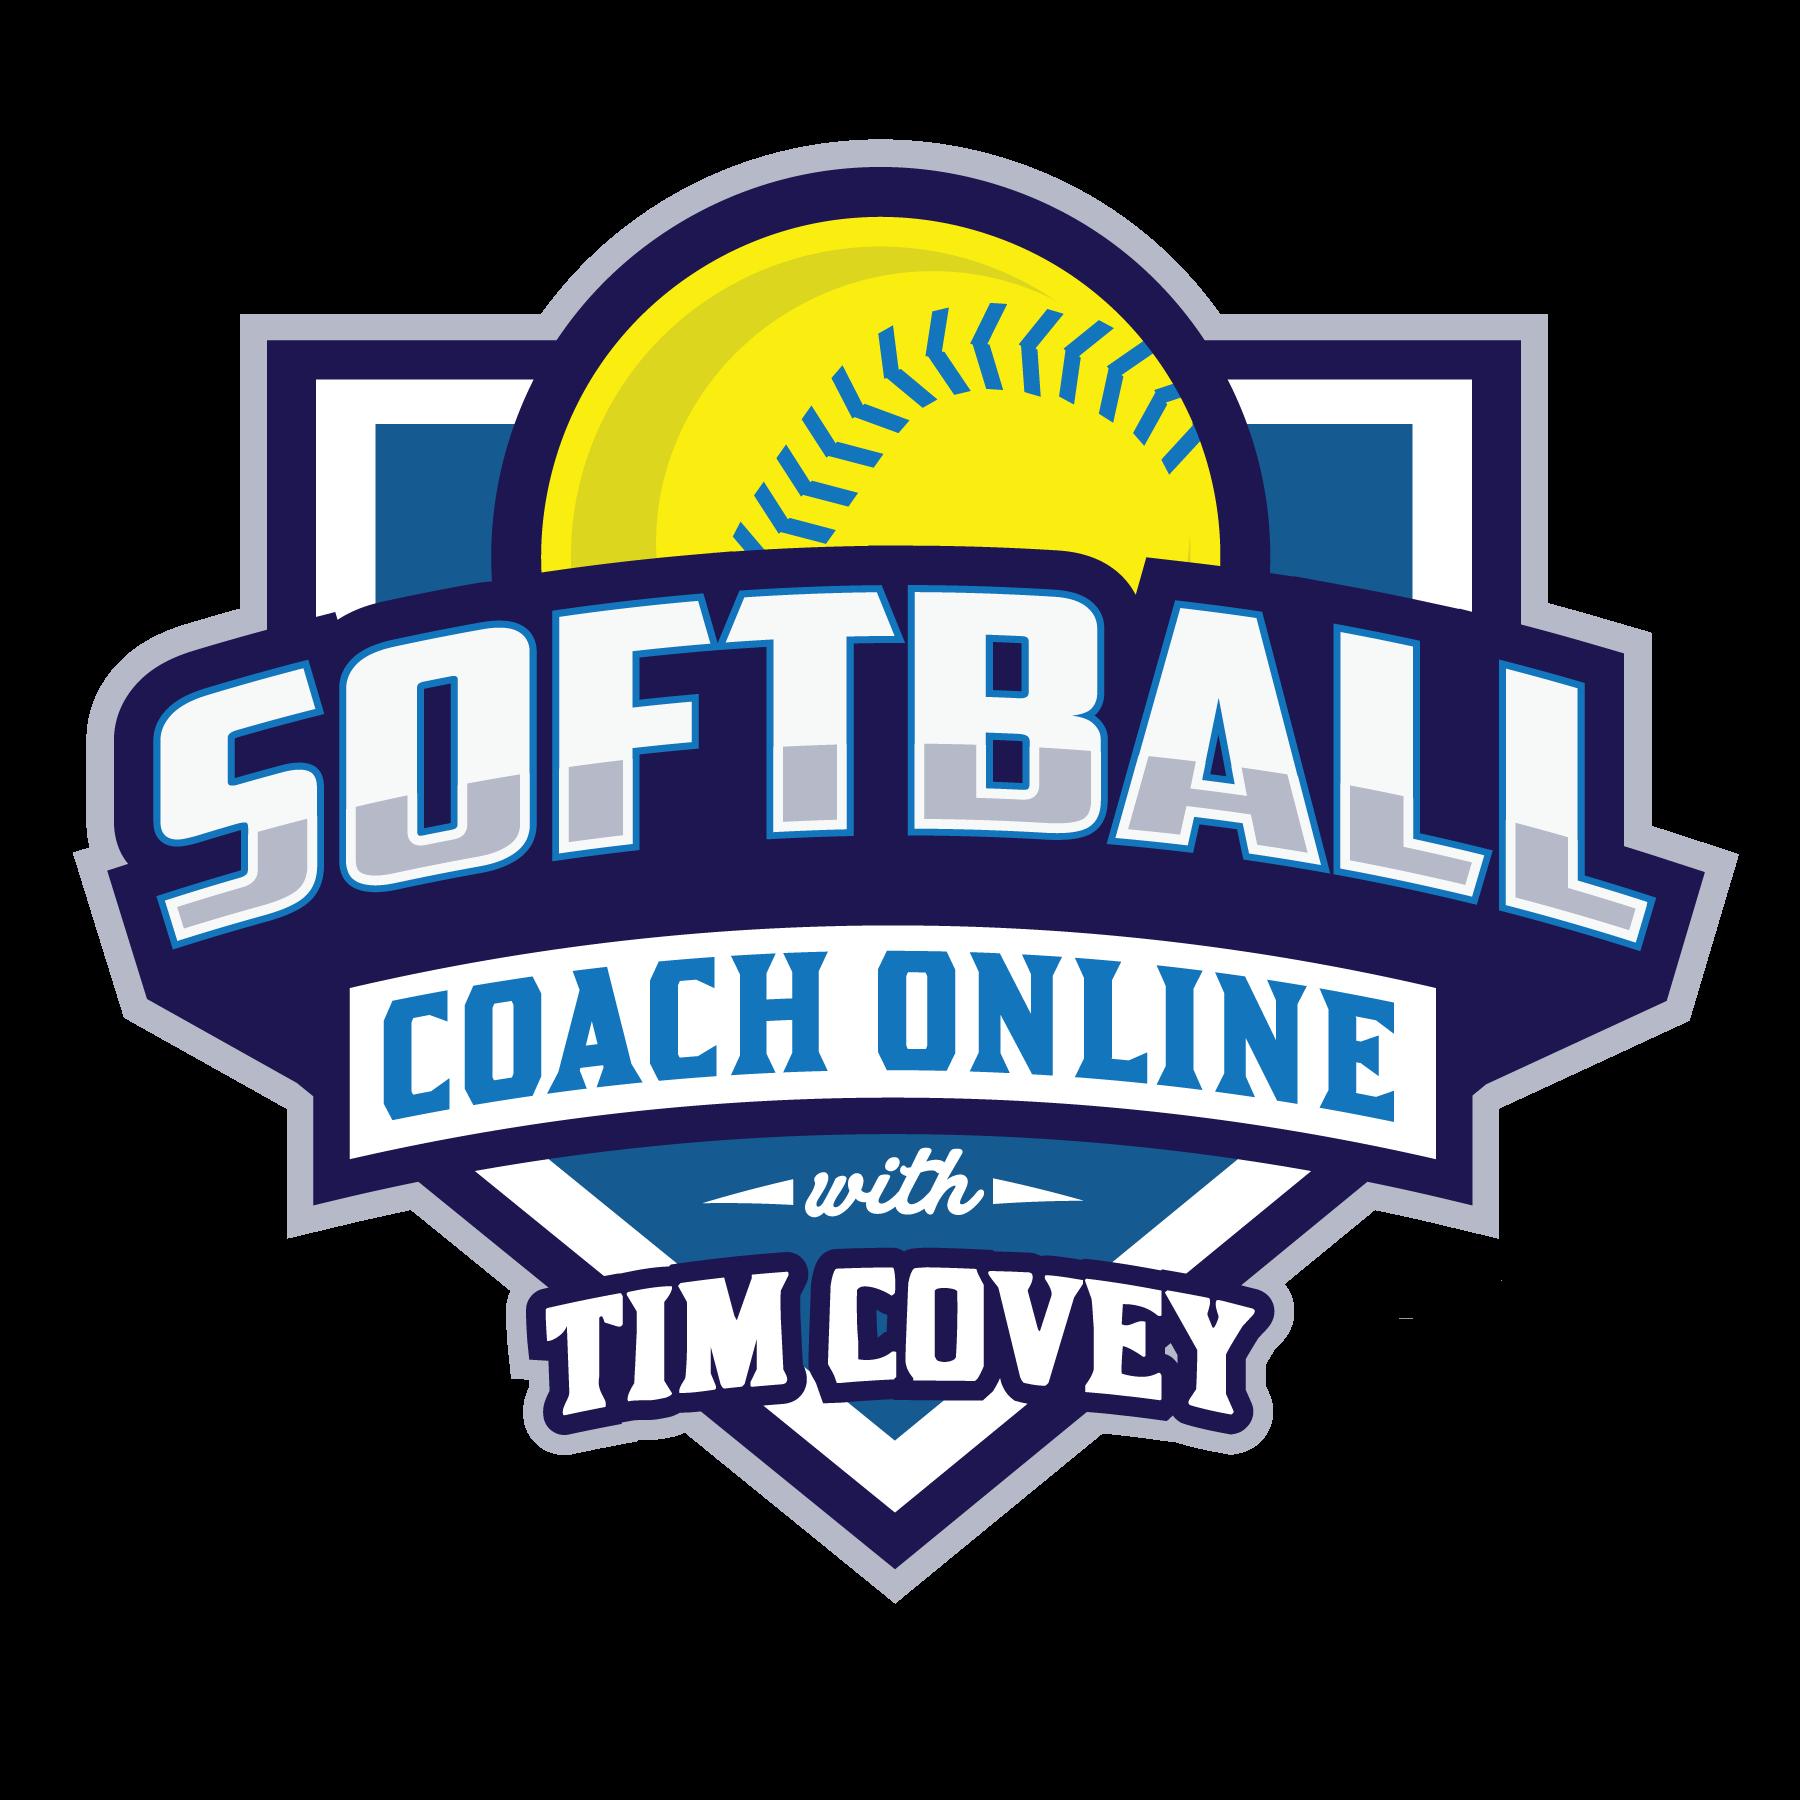 Softball Coach Online Logo.  Creating a Logo for a brand that provides training for softball coaches